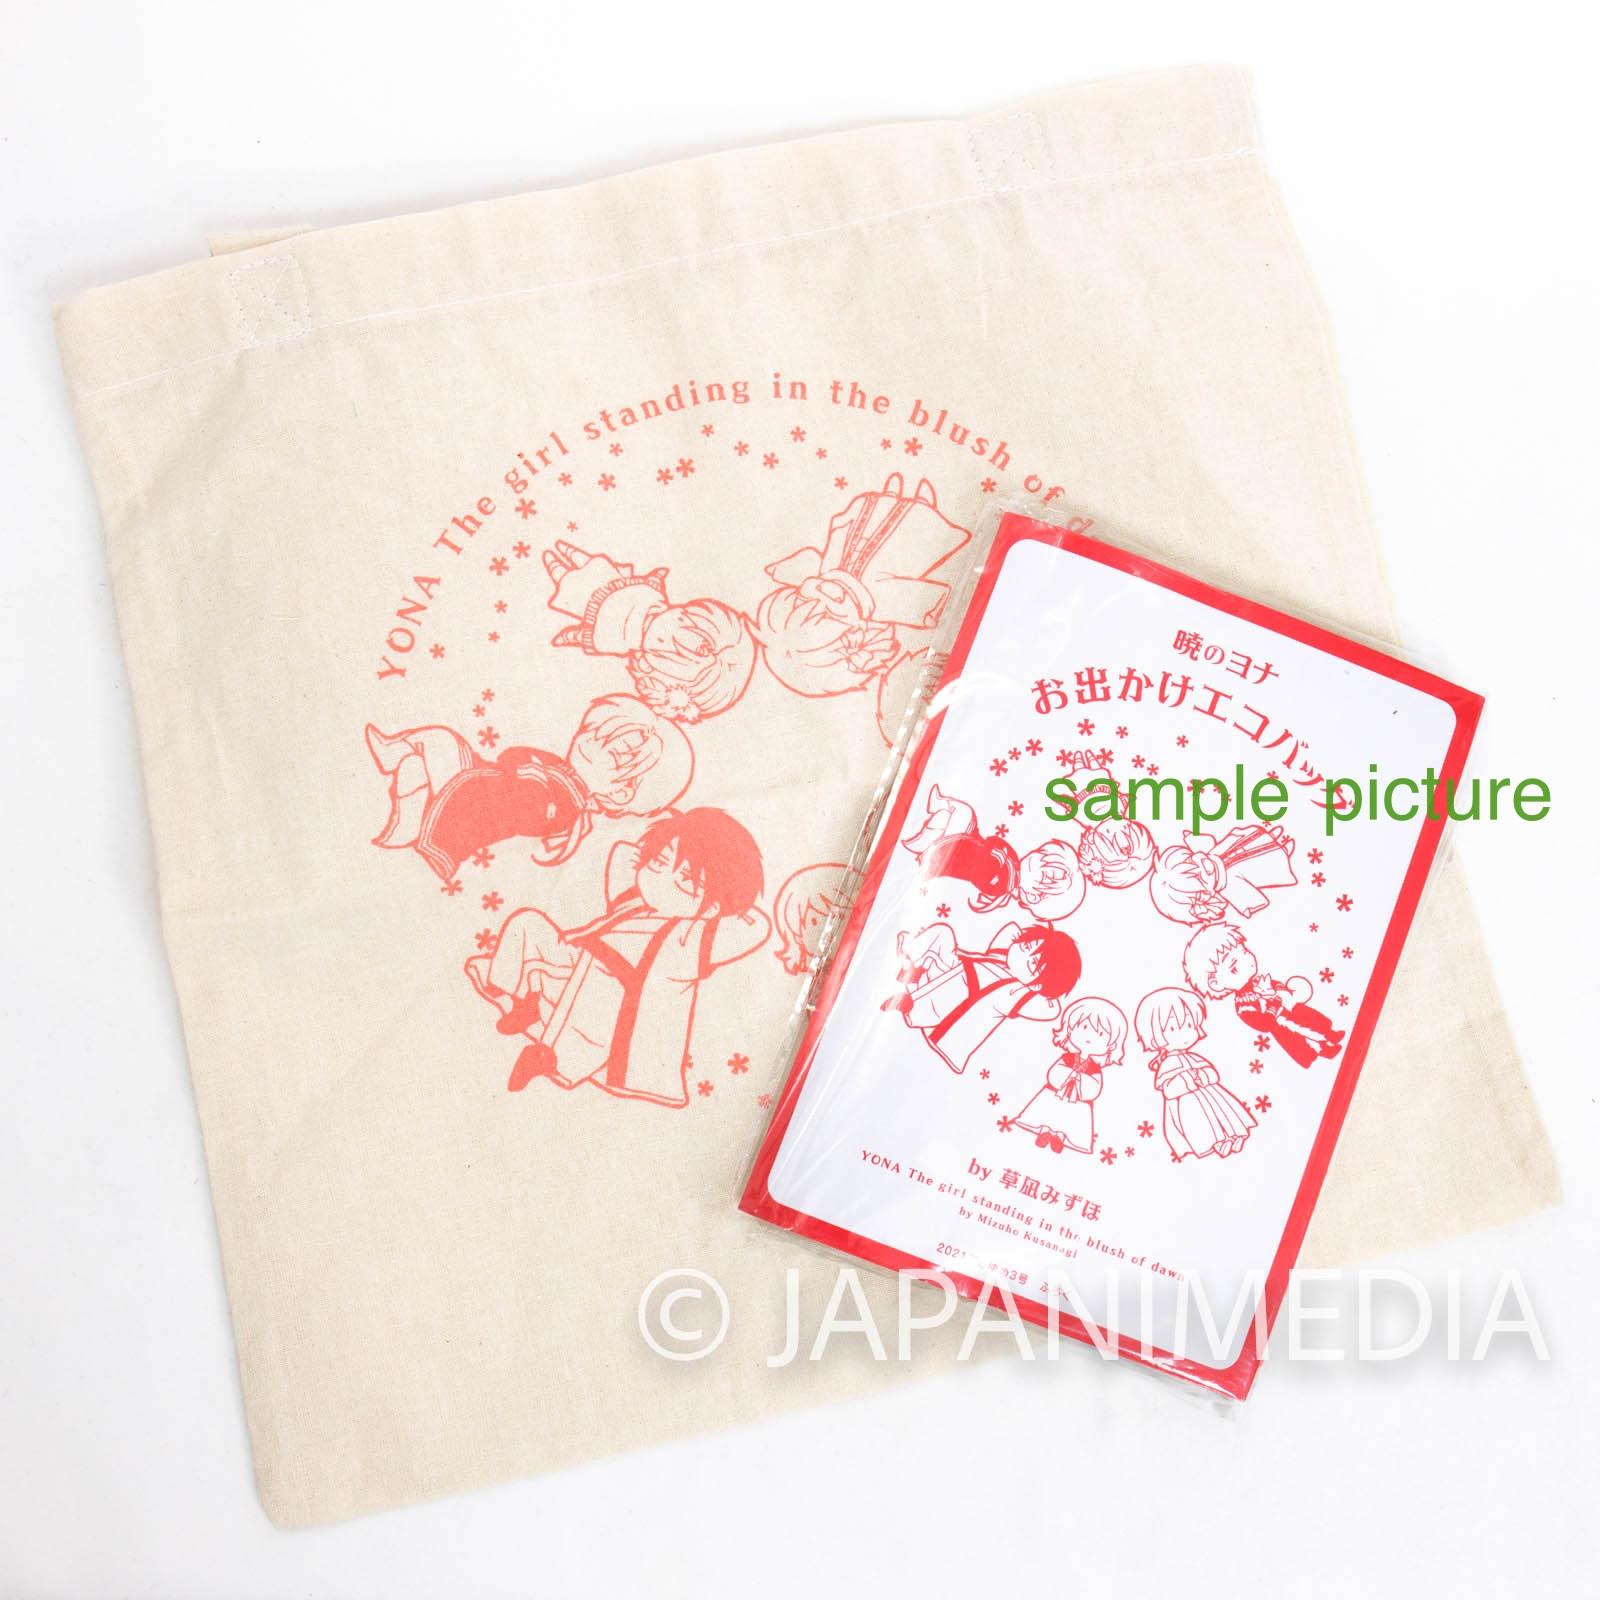 Yona of the Dawn Cotton Tote Bag [Yona / Haku / Yun / Kija / Sinha / Jaeha / Zeno] JAPAN MANGA